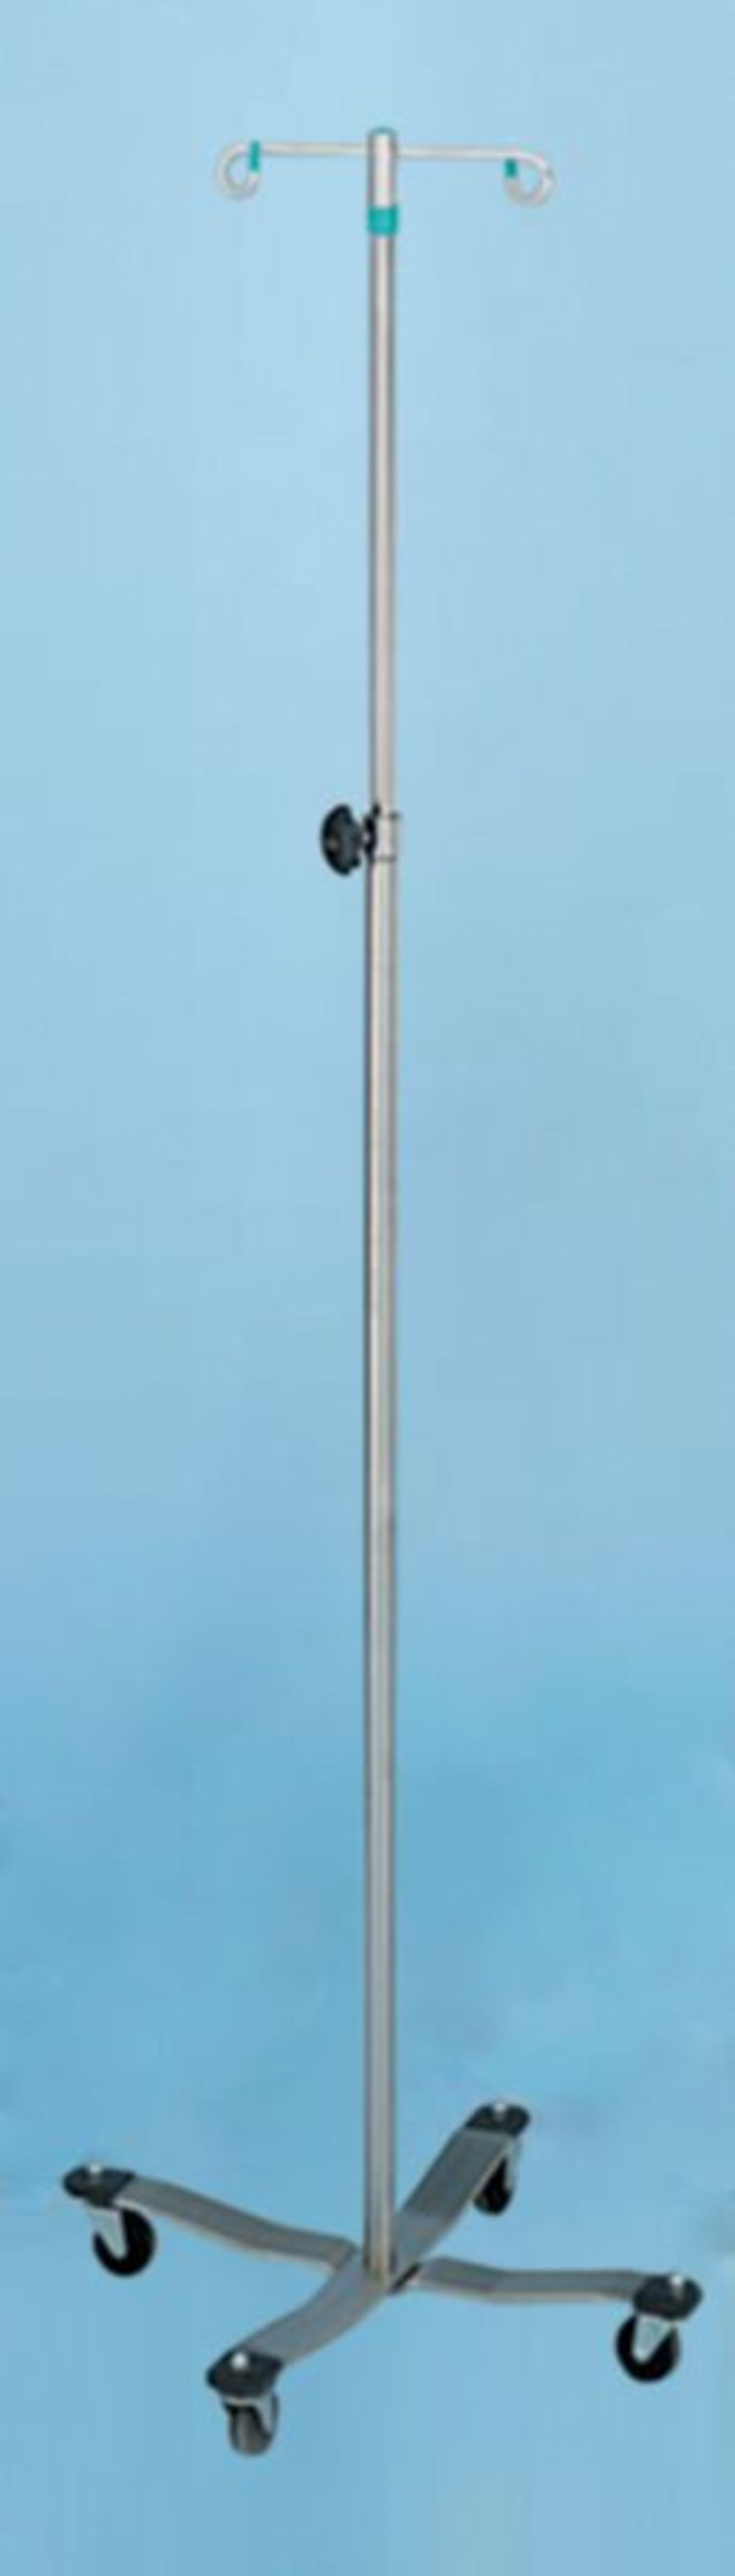 2-hook IV pole / telescopic / on casters IVP-6250 BRYTON CORPORATION